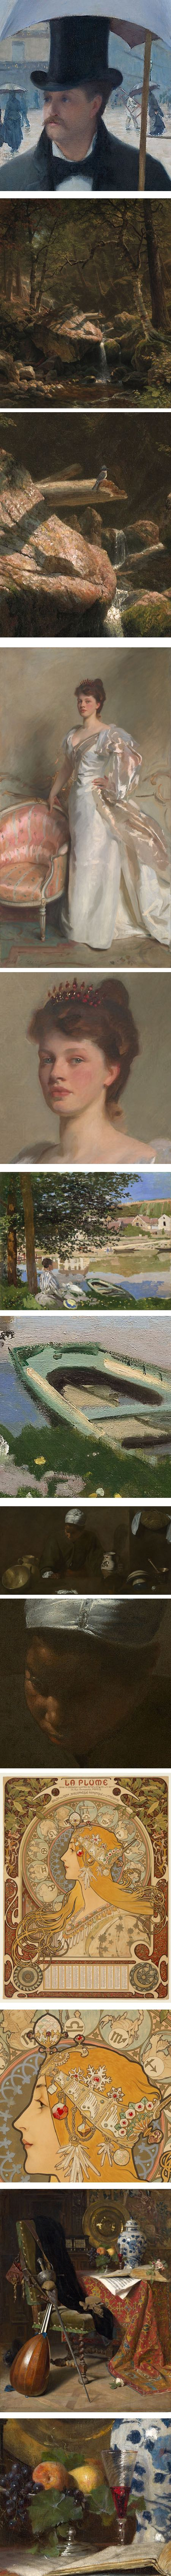 Art Institute of Chicago high-res art images, Gustave Caillebotte, Albert Bierstadt, John SInger Sargent, Claude Monet, Diego Velasquez, Alfons Mucha, Charles Gifford Dye